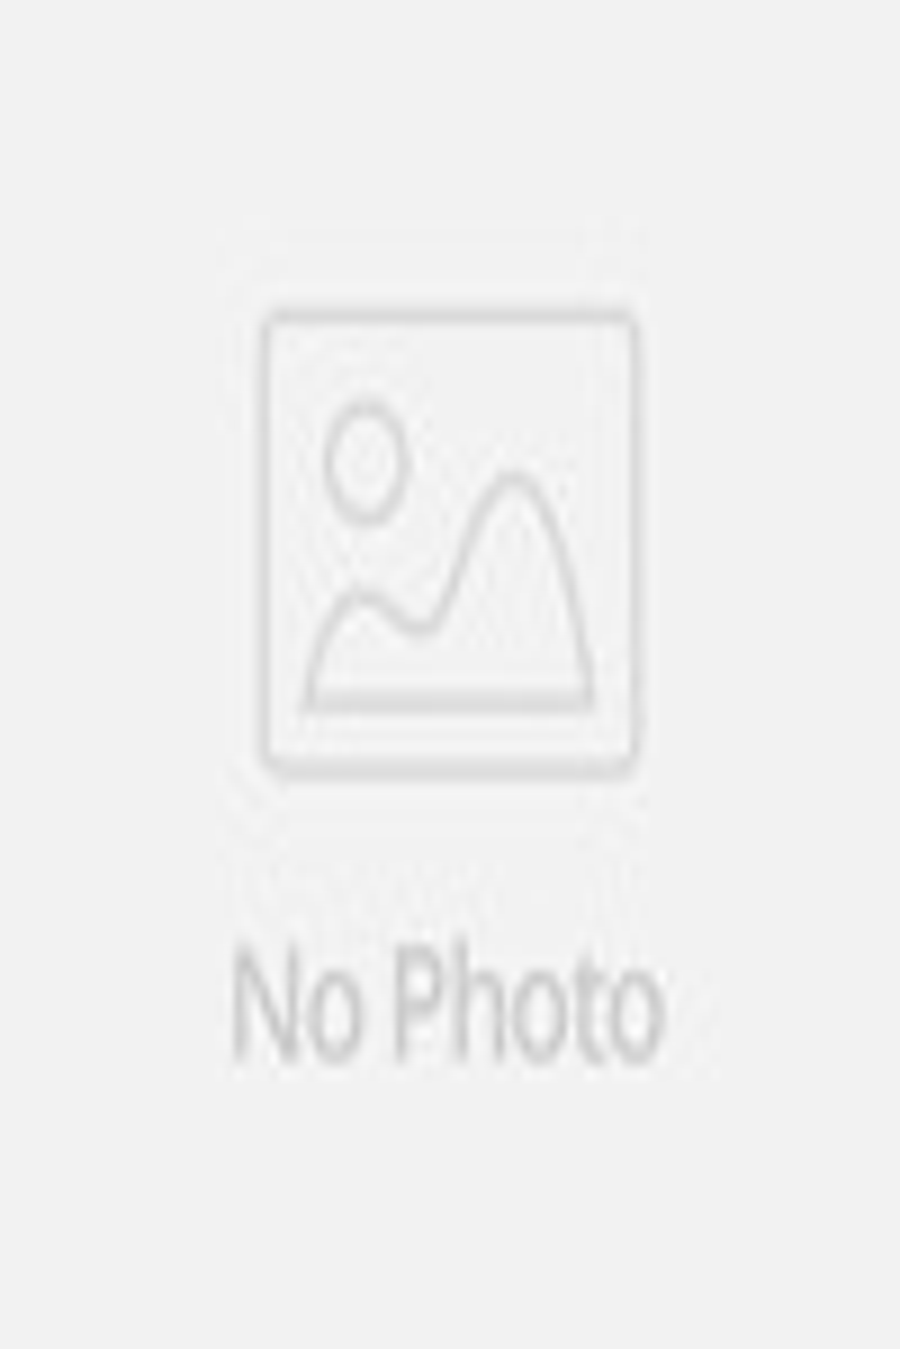 Runway WOOL Navy Jacket UK Winter Long Women Fur Coat With Belt PROMOTION XL(China (Mainland))